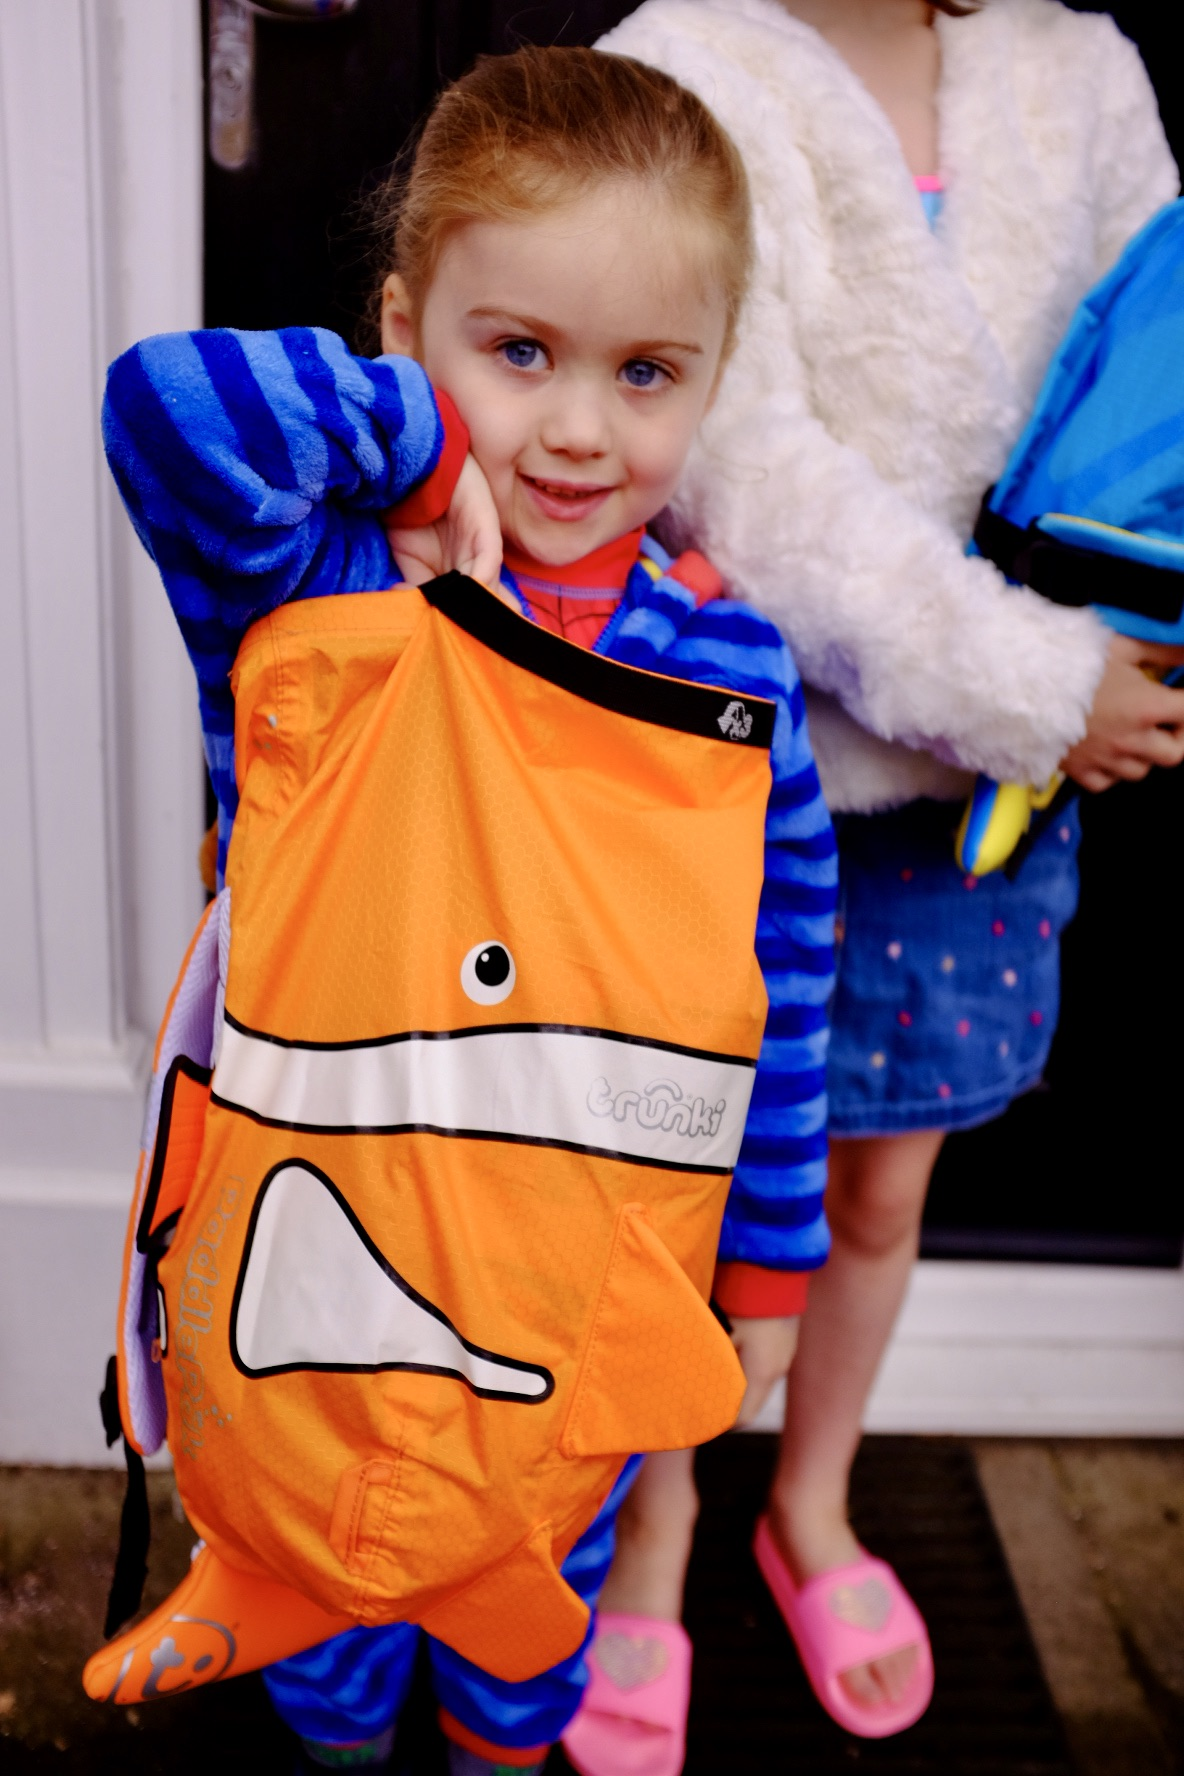 Trunki PaddlePak – Back to Swimming with Ease| AD